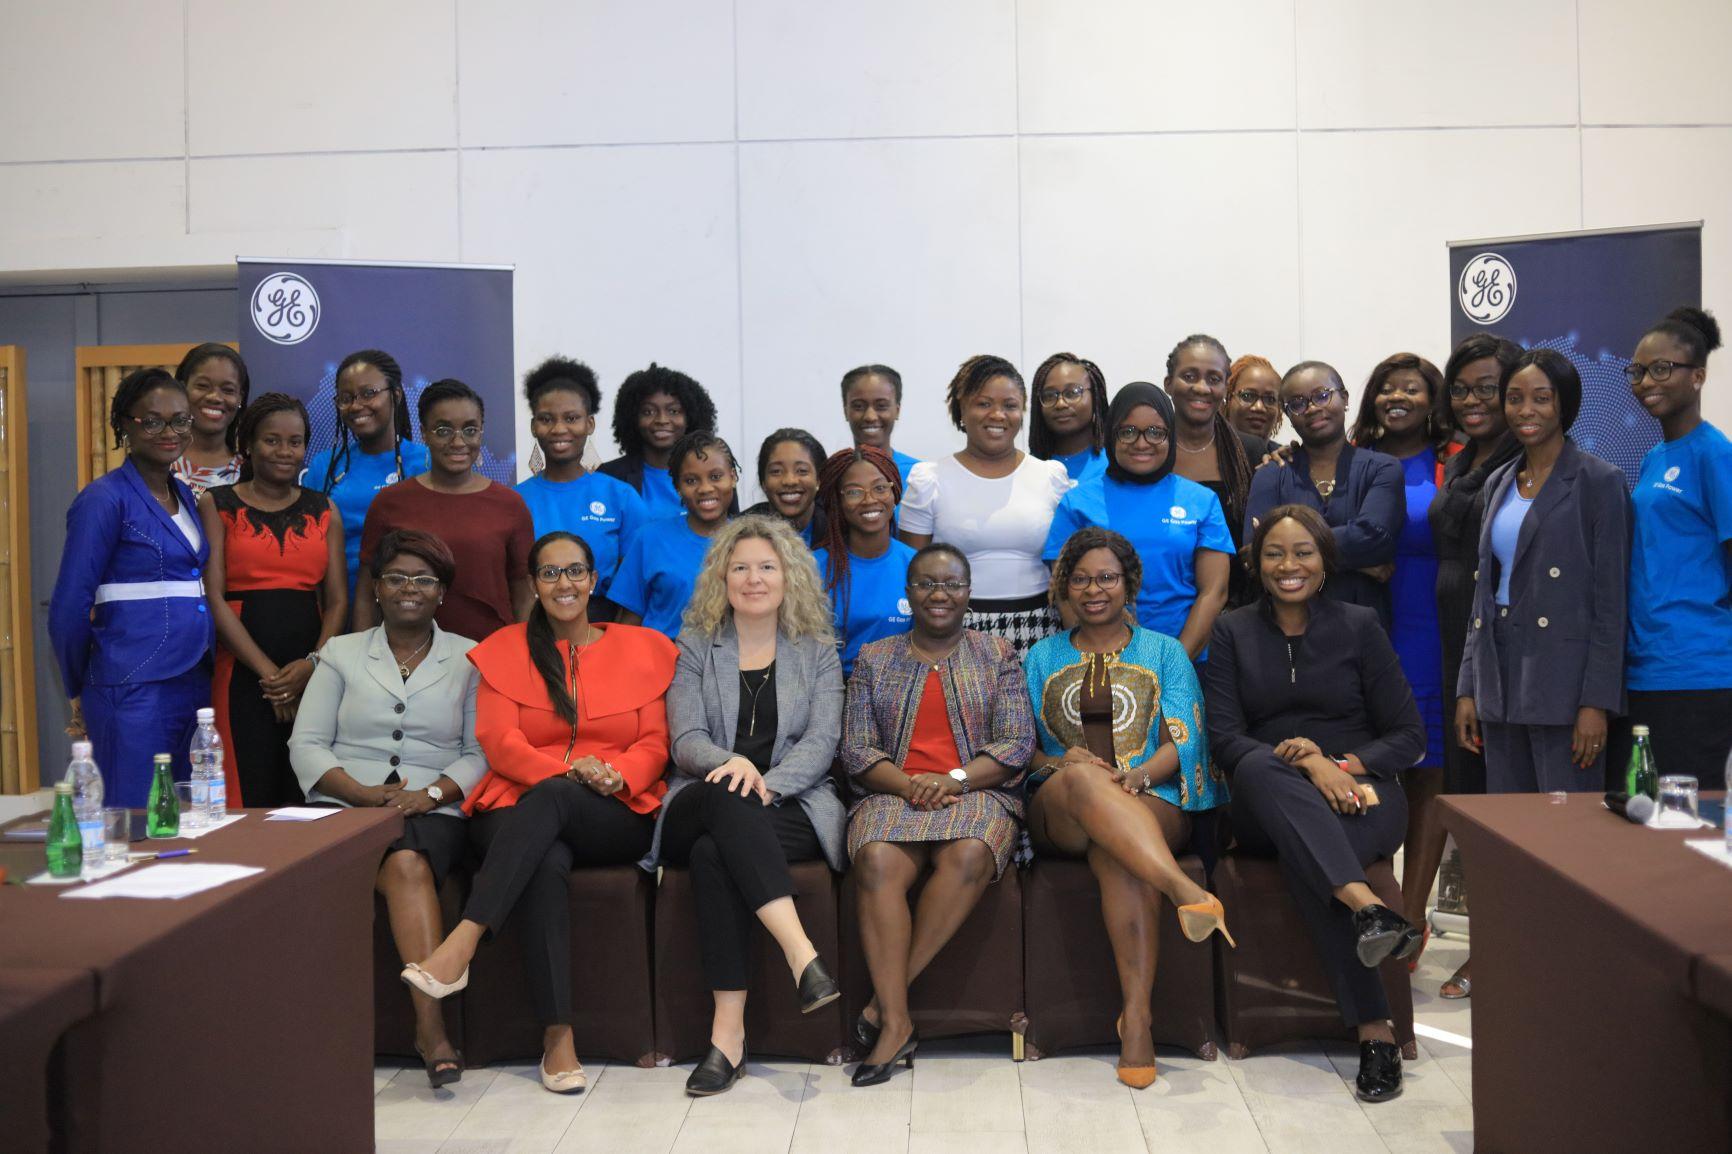 GE Hosts Women STEM Roundtable: Women in Technology